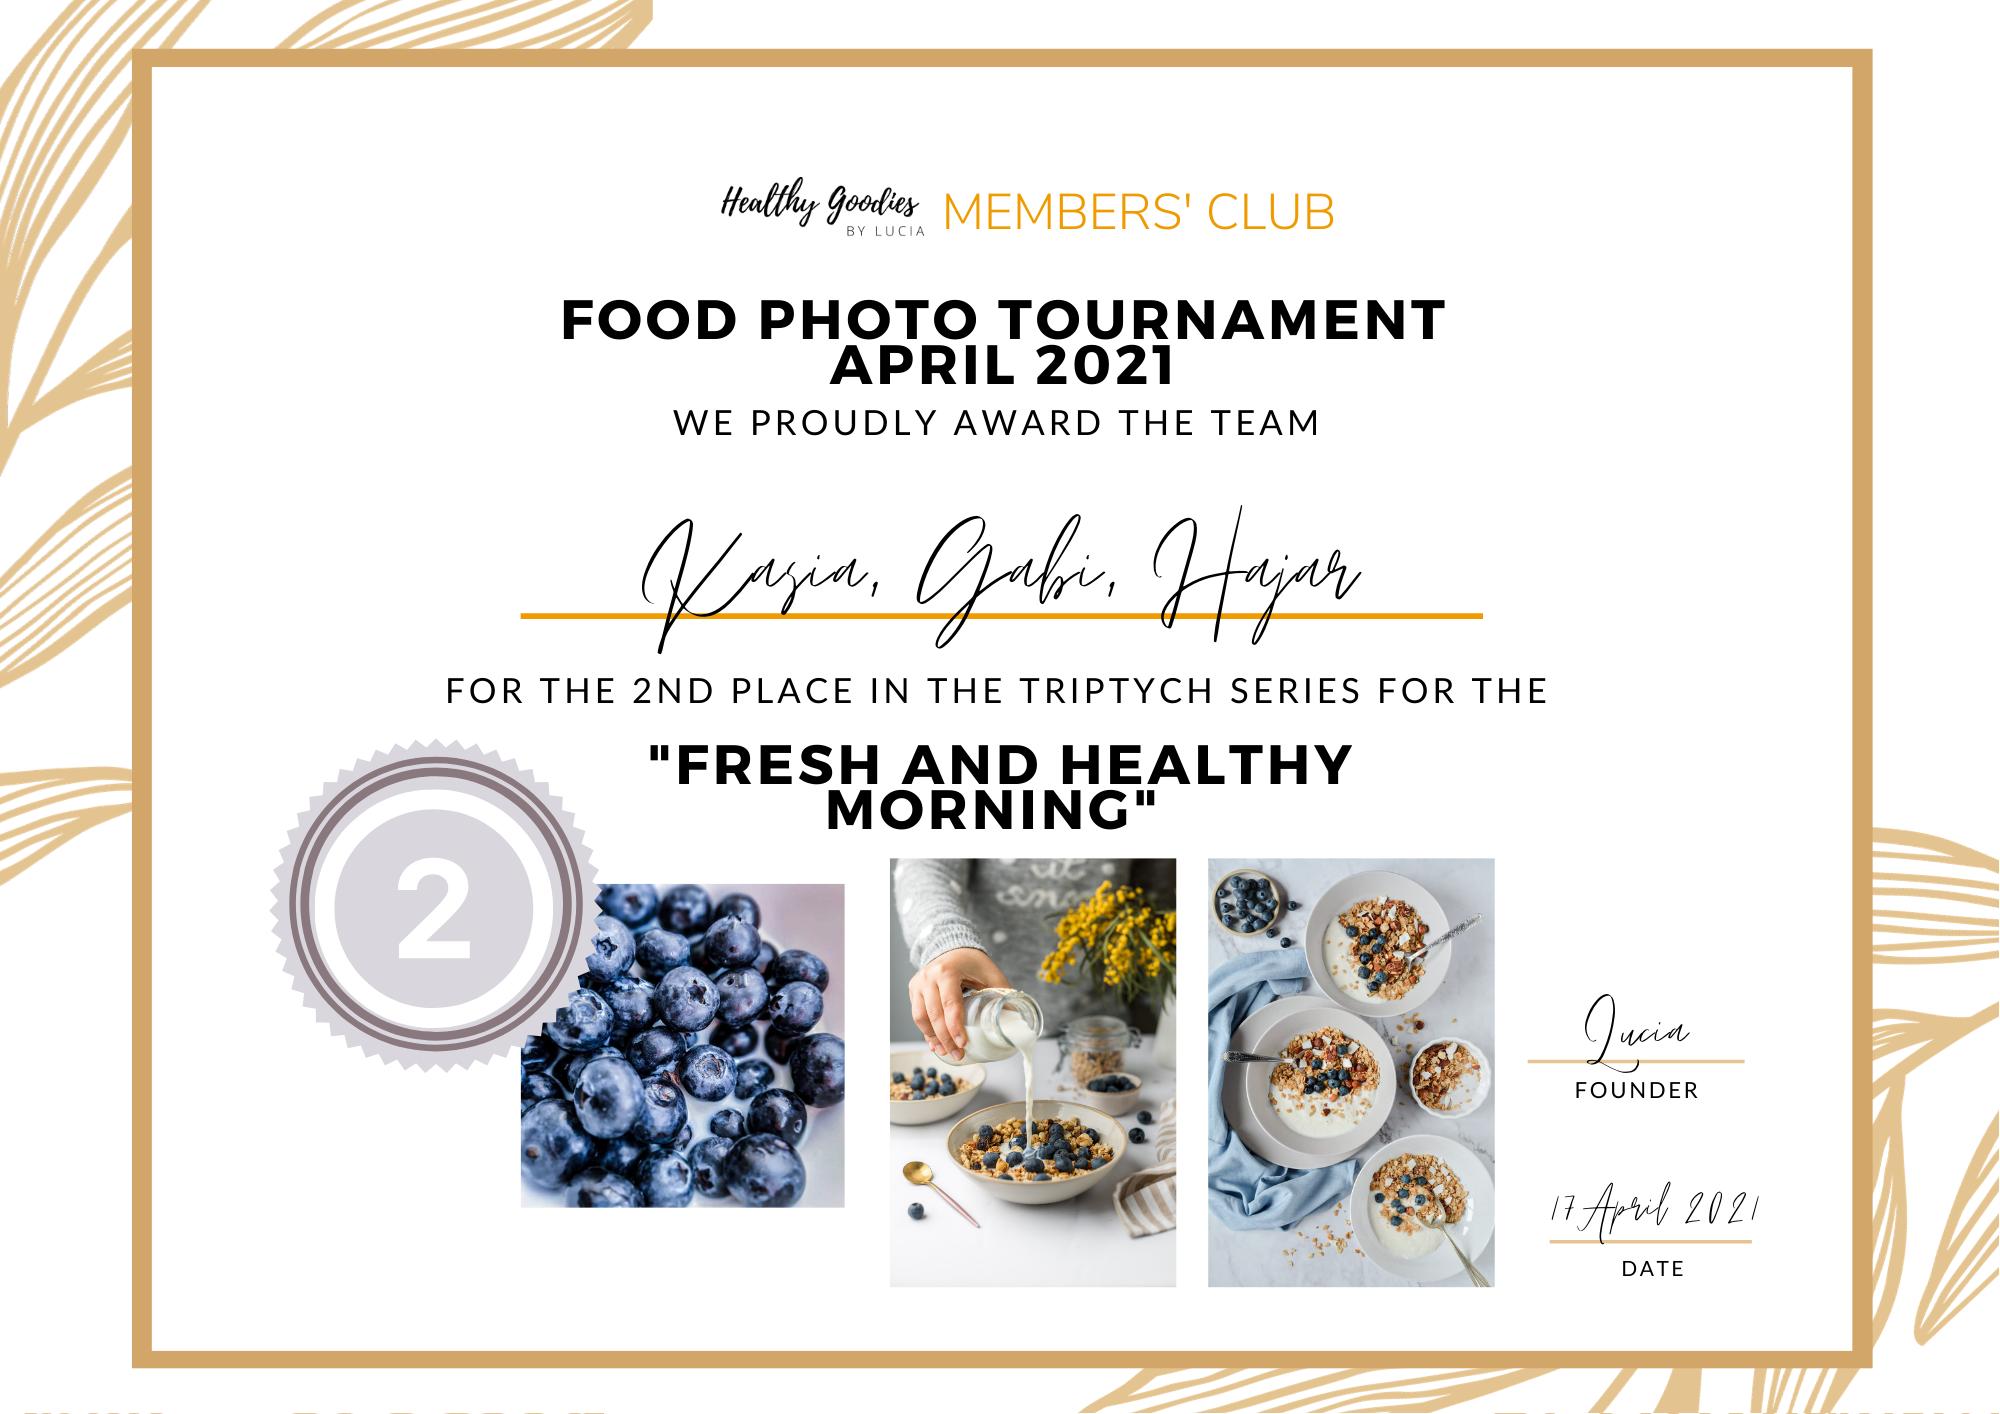 Second place - Food Photo Tournament